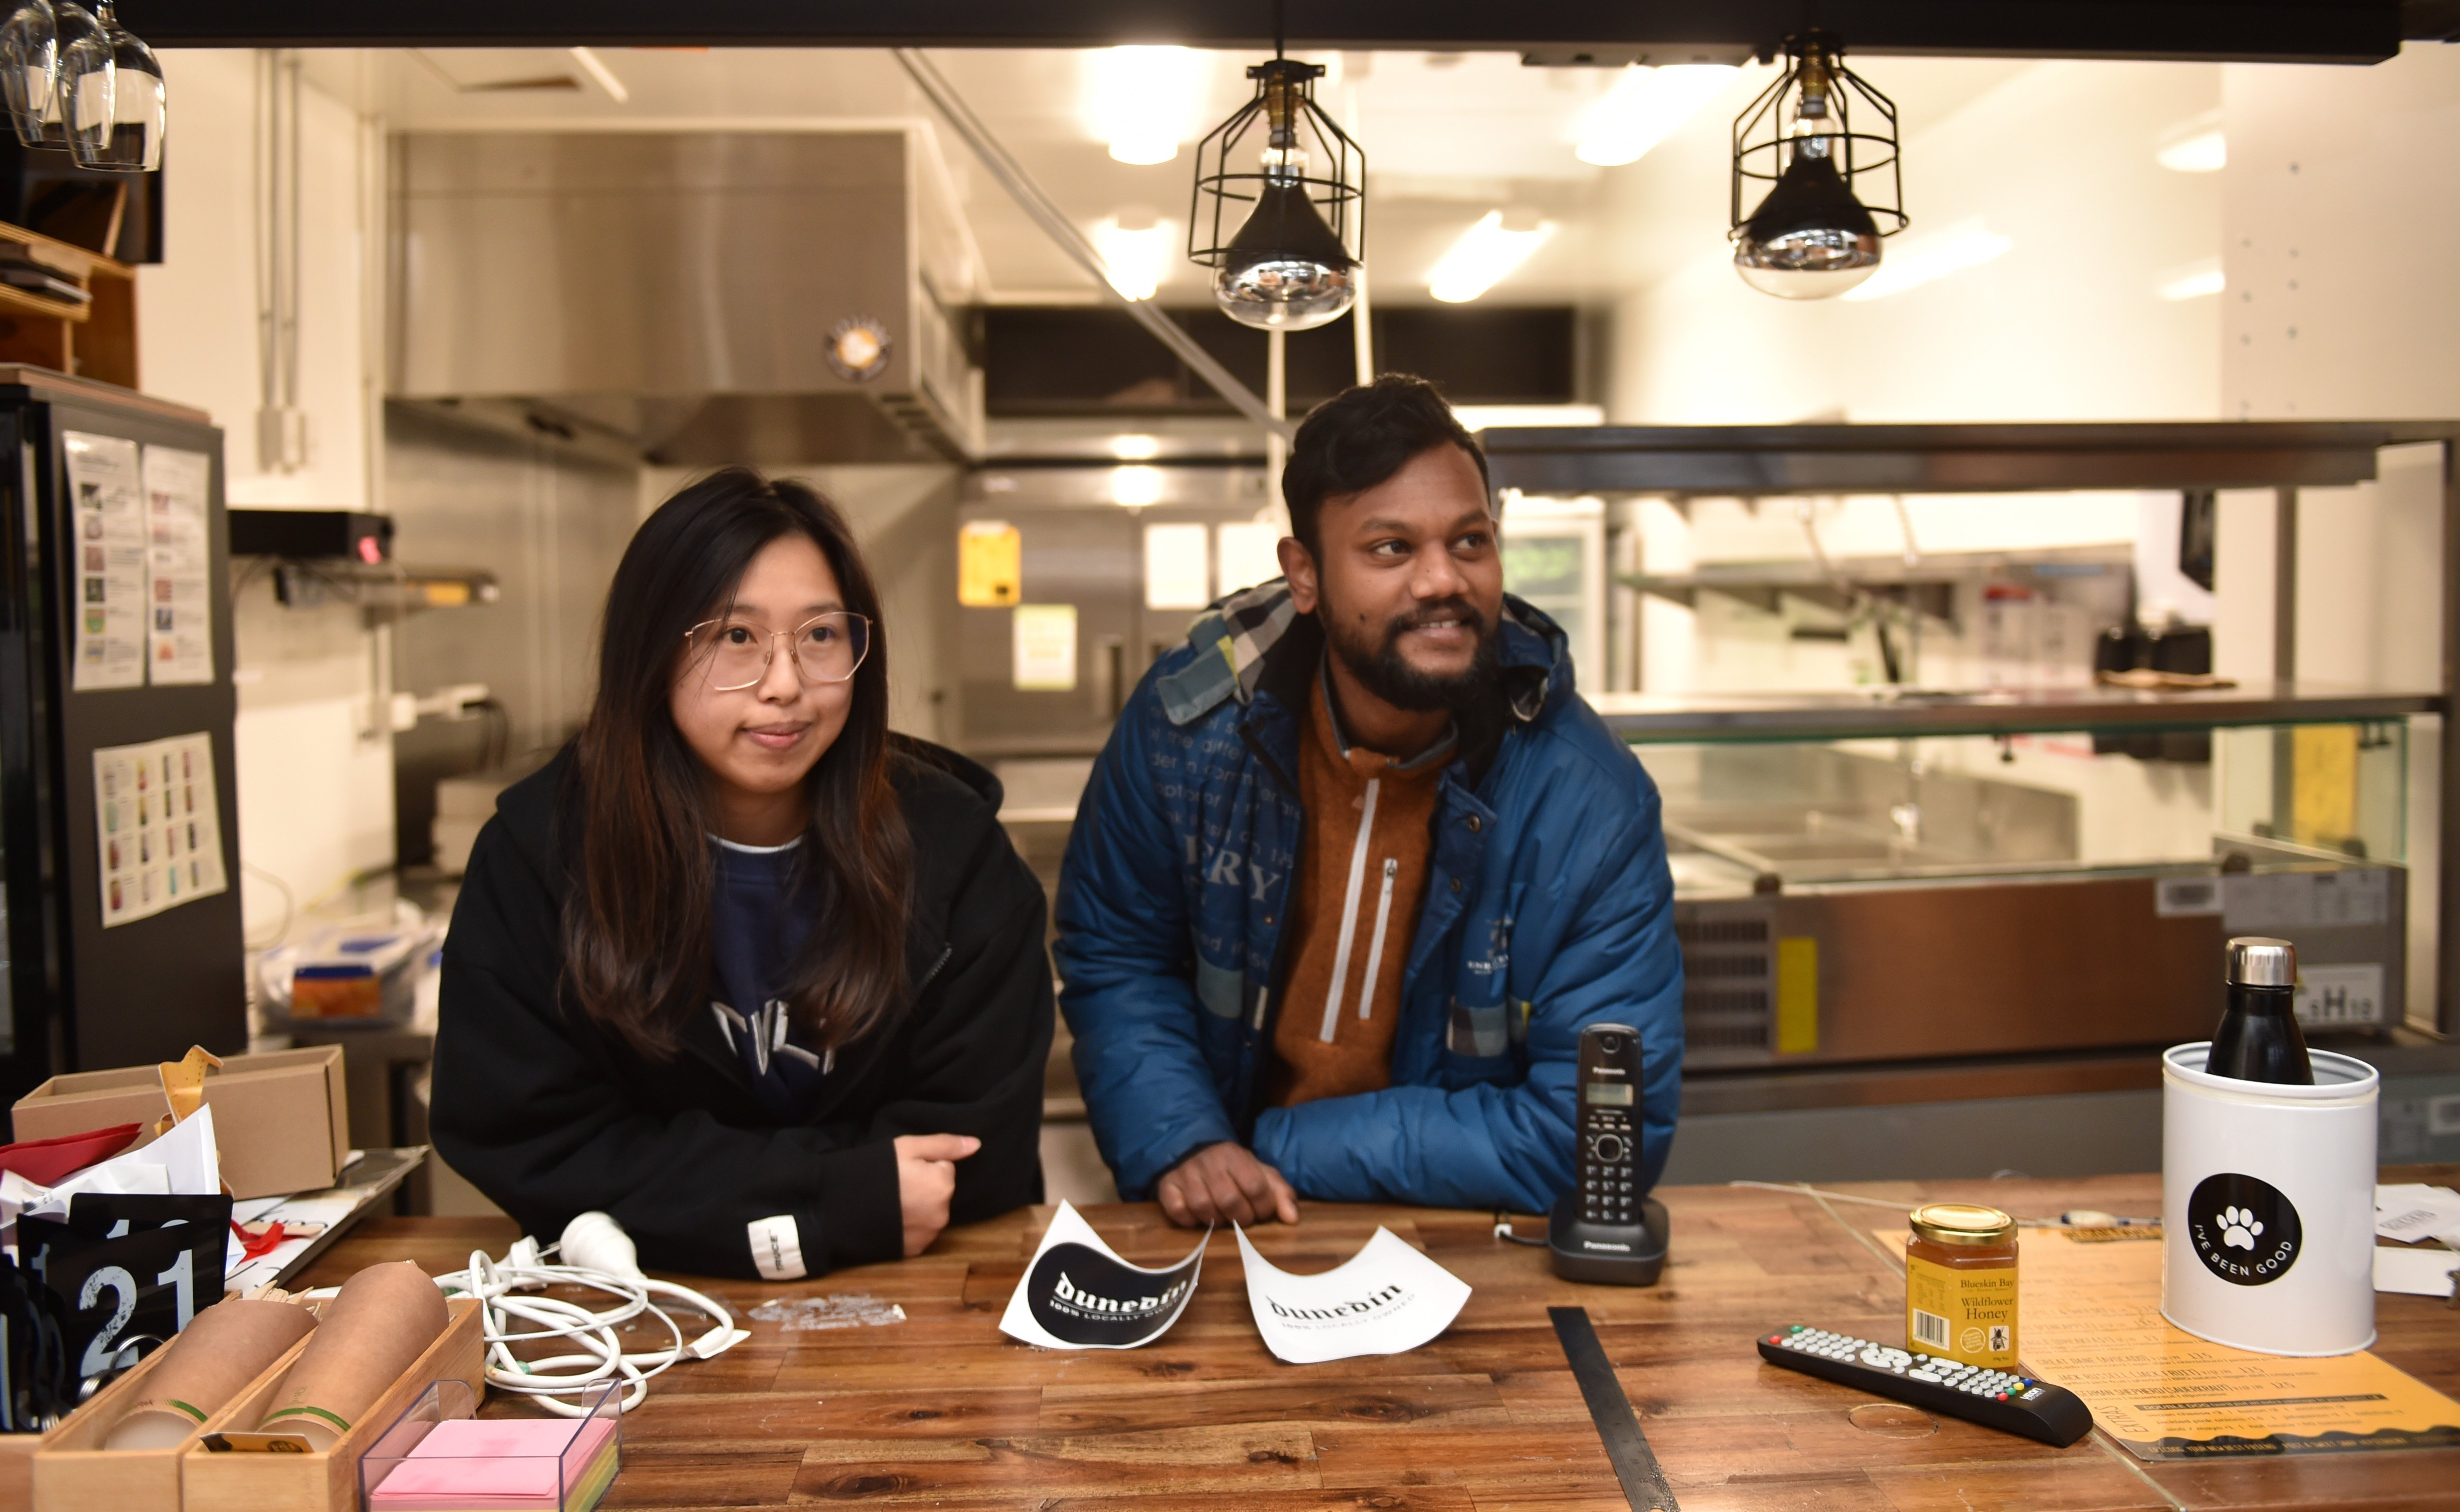 Judy Ling and Neeraj Kumar Mothuku  stand at the bar of  Burger N Beast restaurant, set to open...